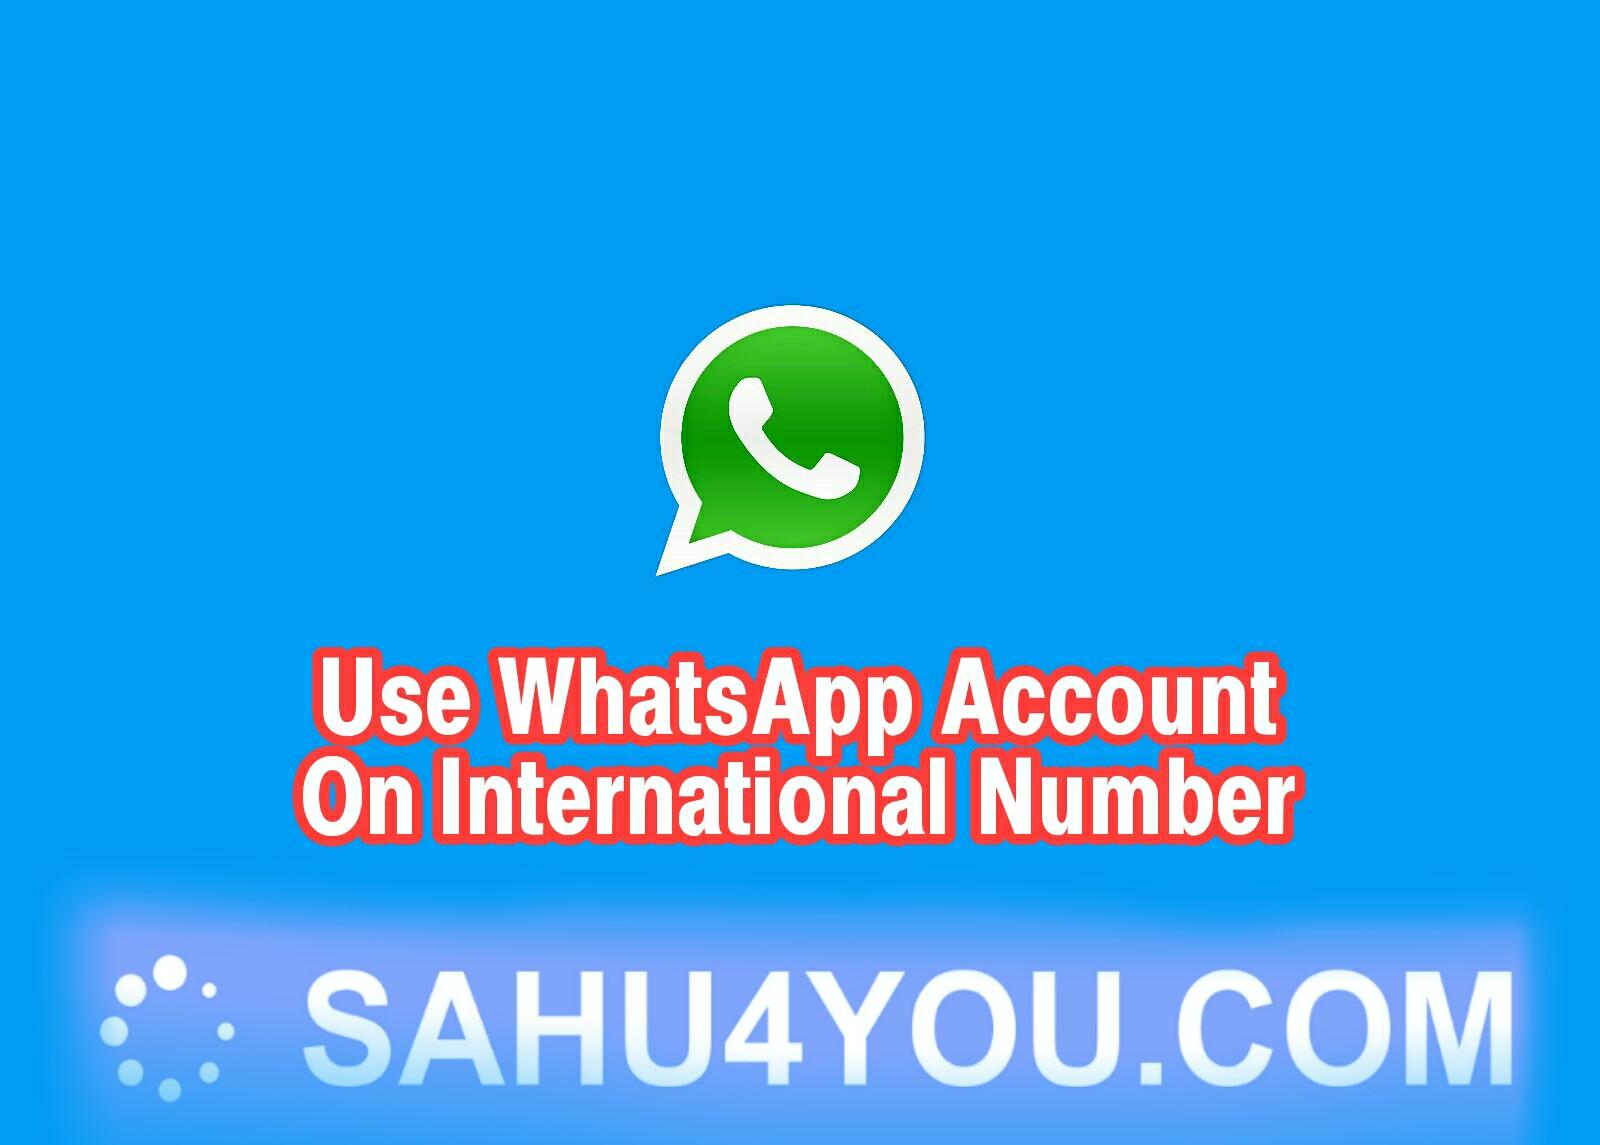 Create WhatsApp Account With International Number (100% Working Method)